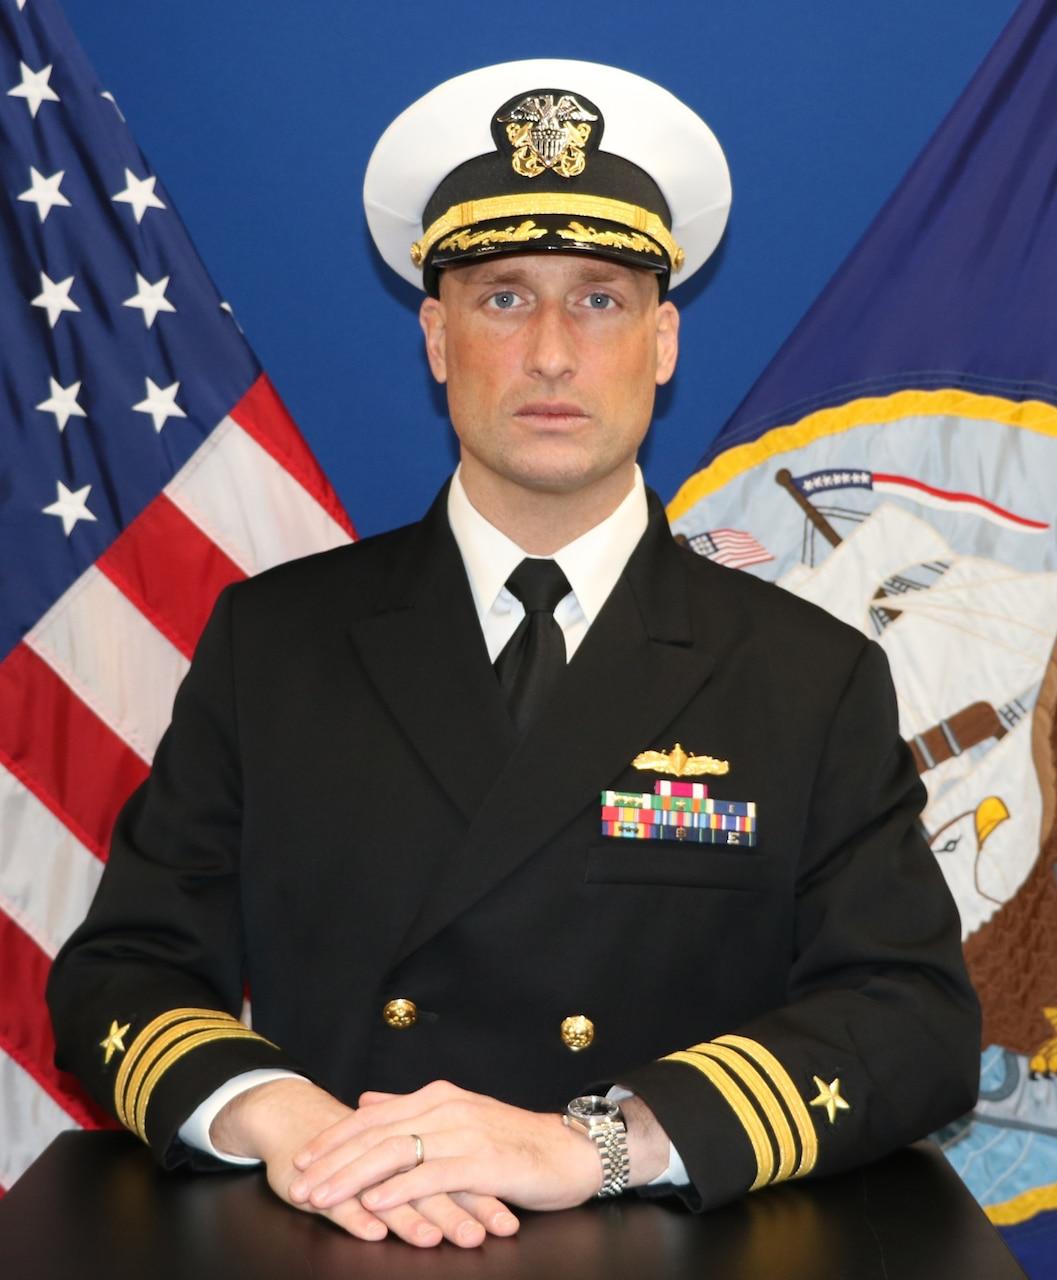 Commander John N. Van Wagoner